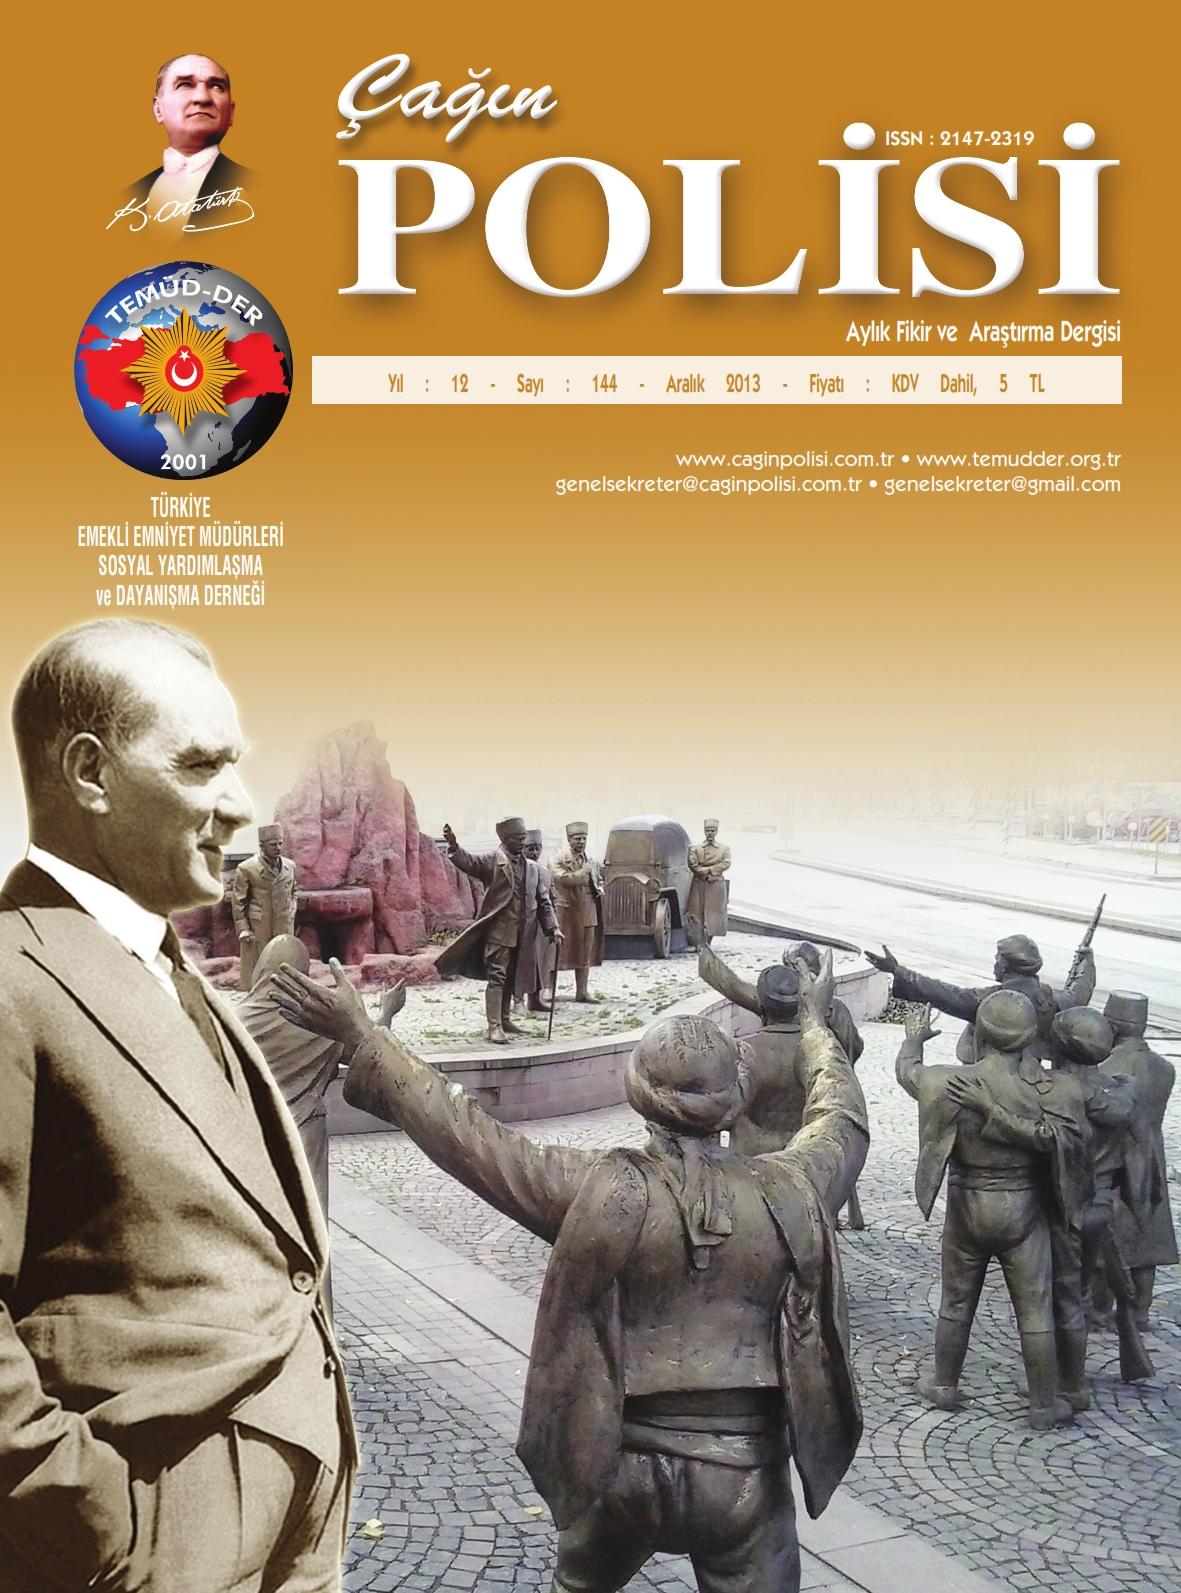 polis_dergi_aralik_2013_int_001